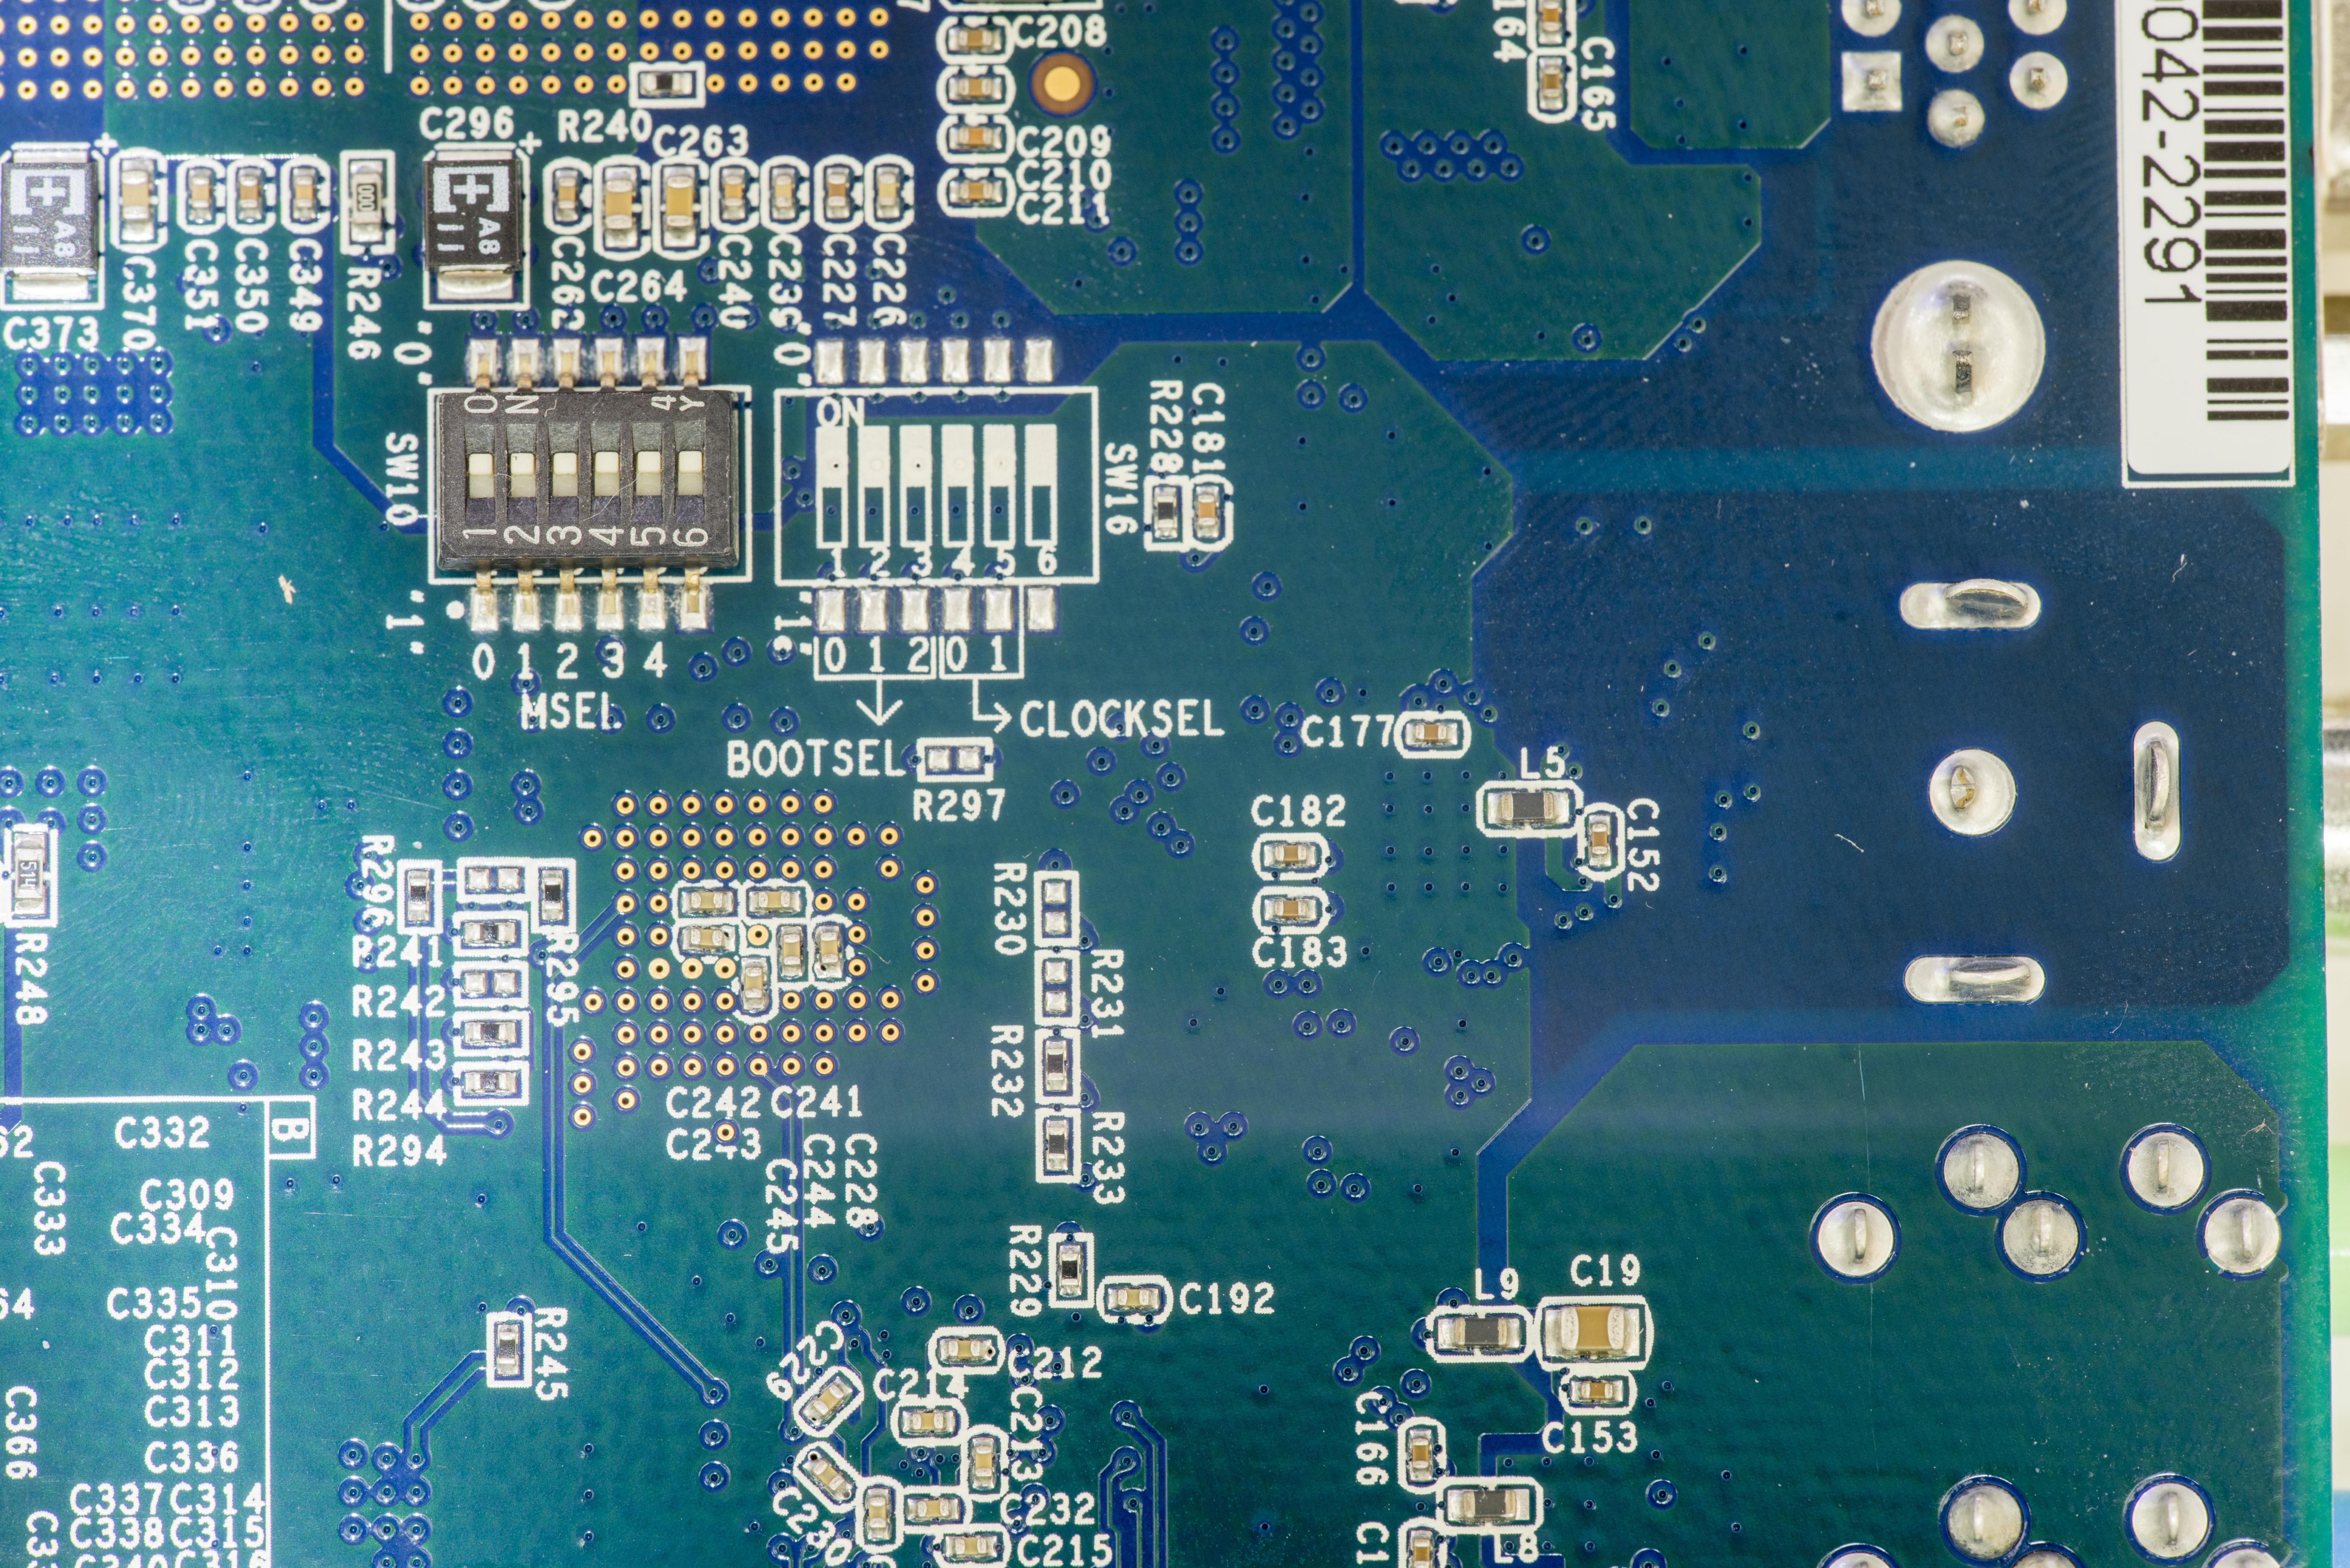 xDevs com | Using ALTERA/Terasic DE1-SoC (Cyclone V SE FPGA